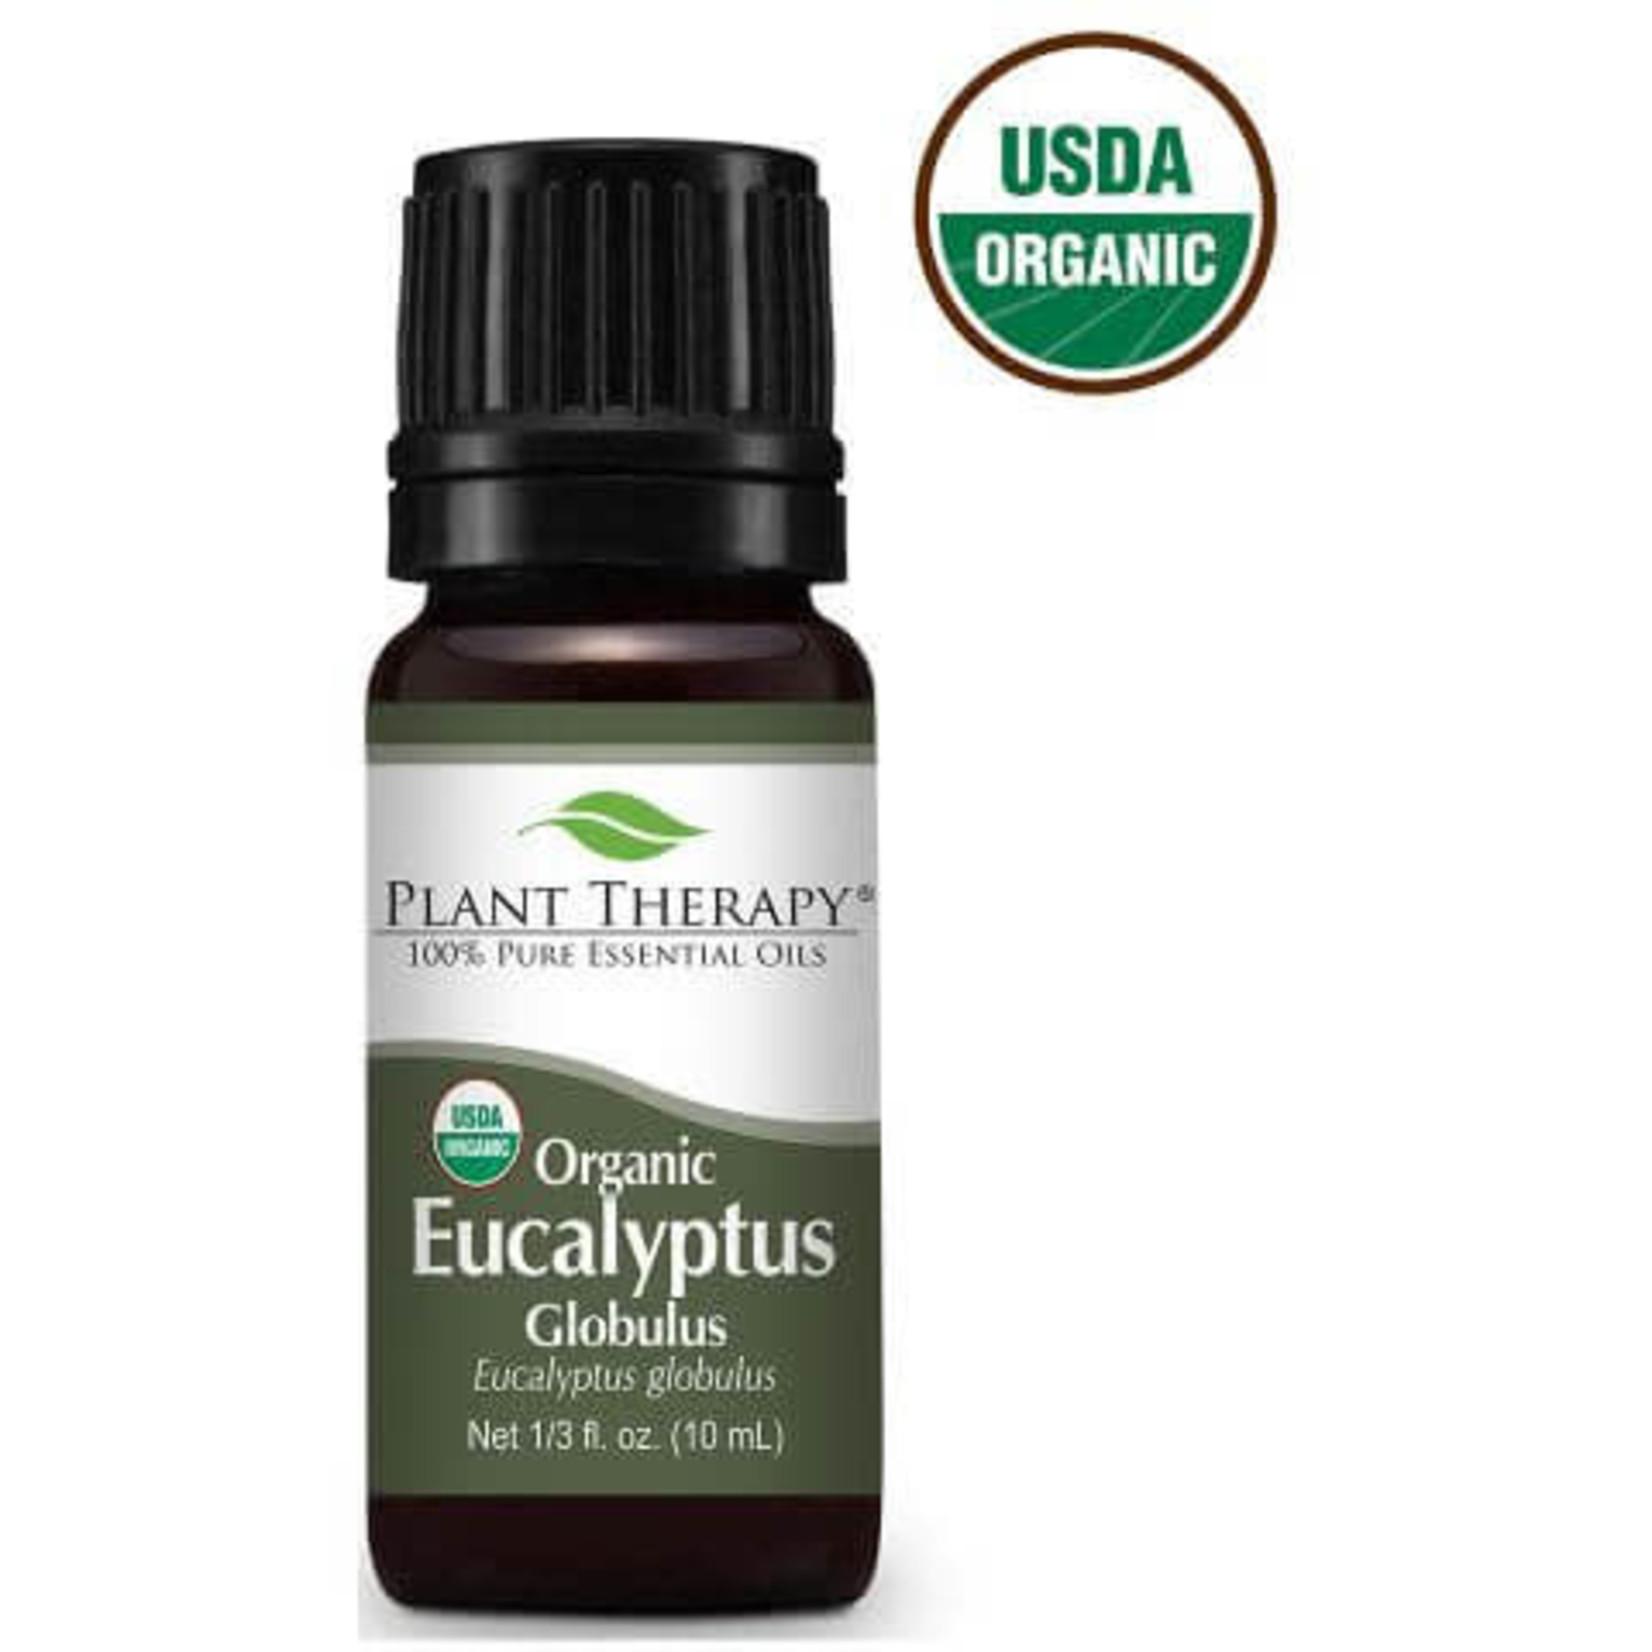 Plant Therapy PT Eucalyptus Globulus Organic Essential Oil 10ml